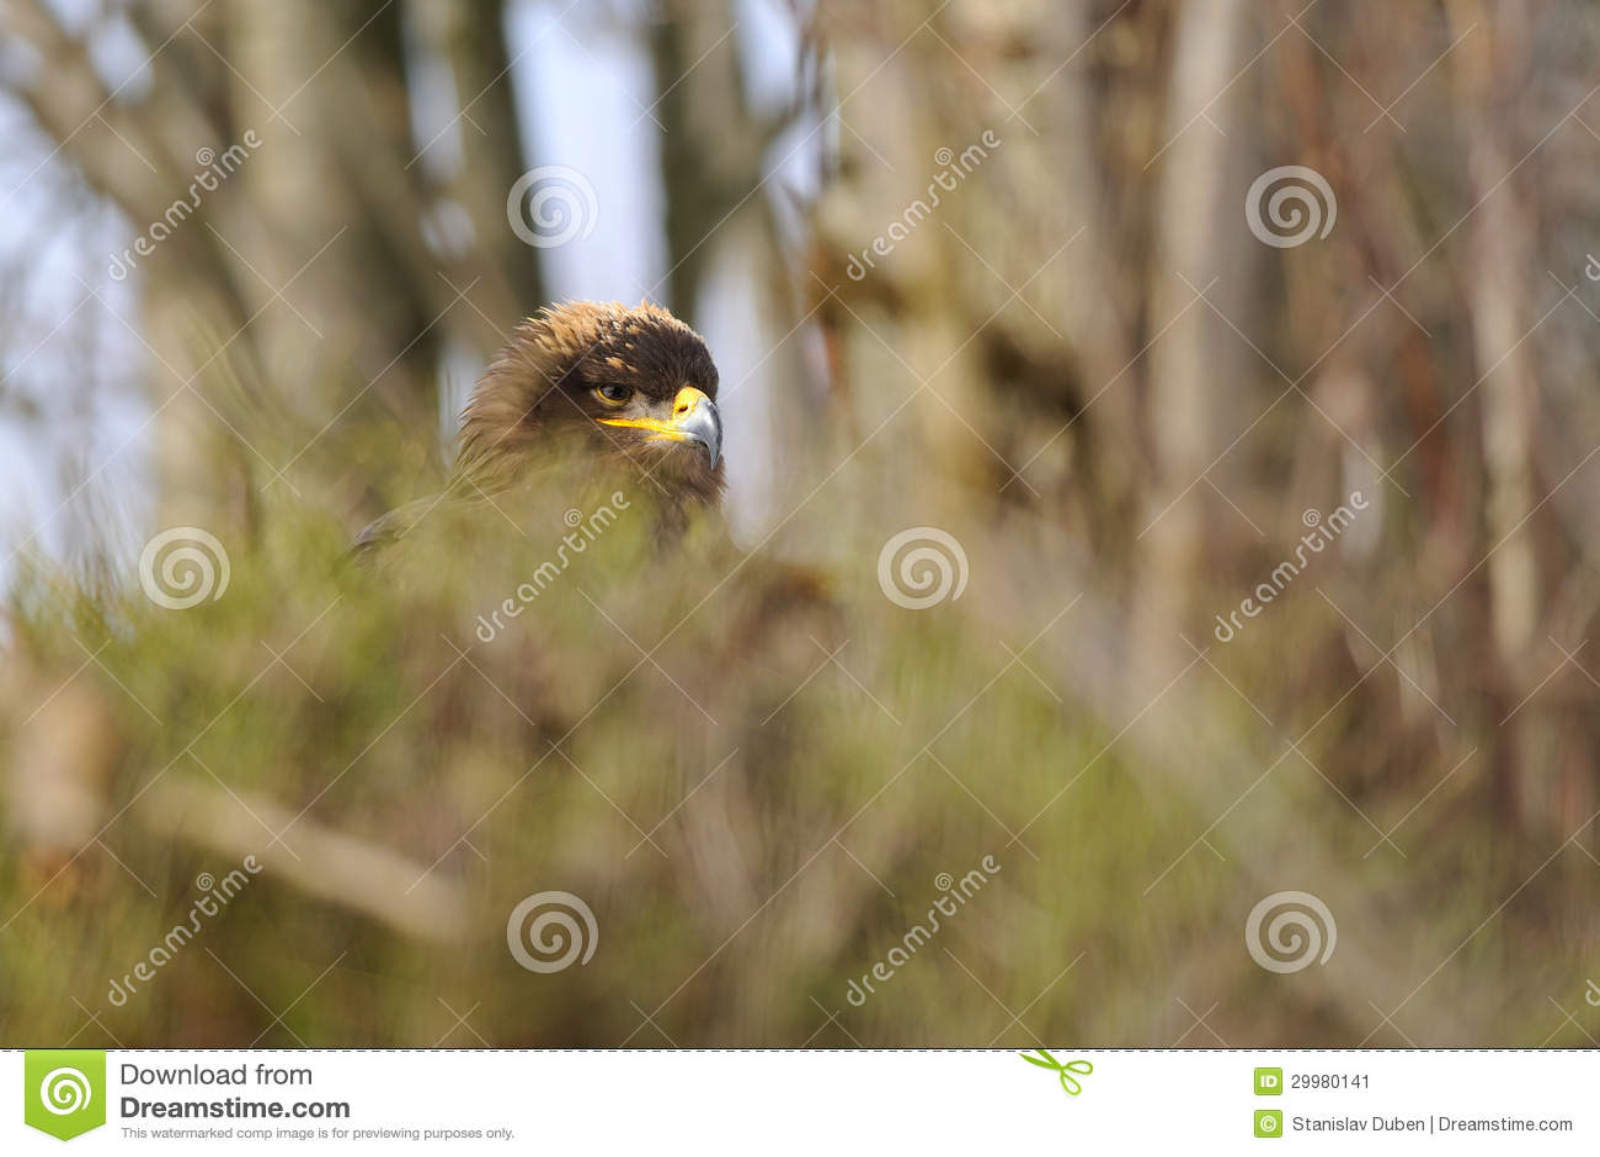 Steppe Eagle hidden in bush branches